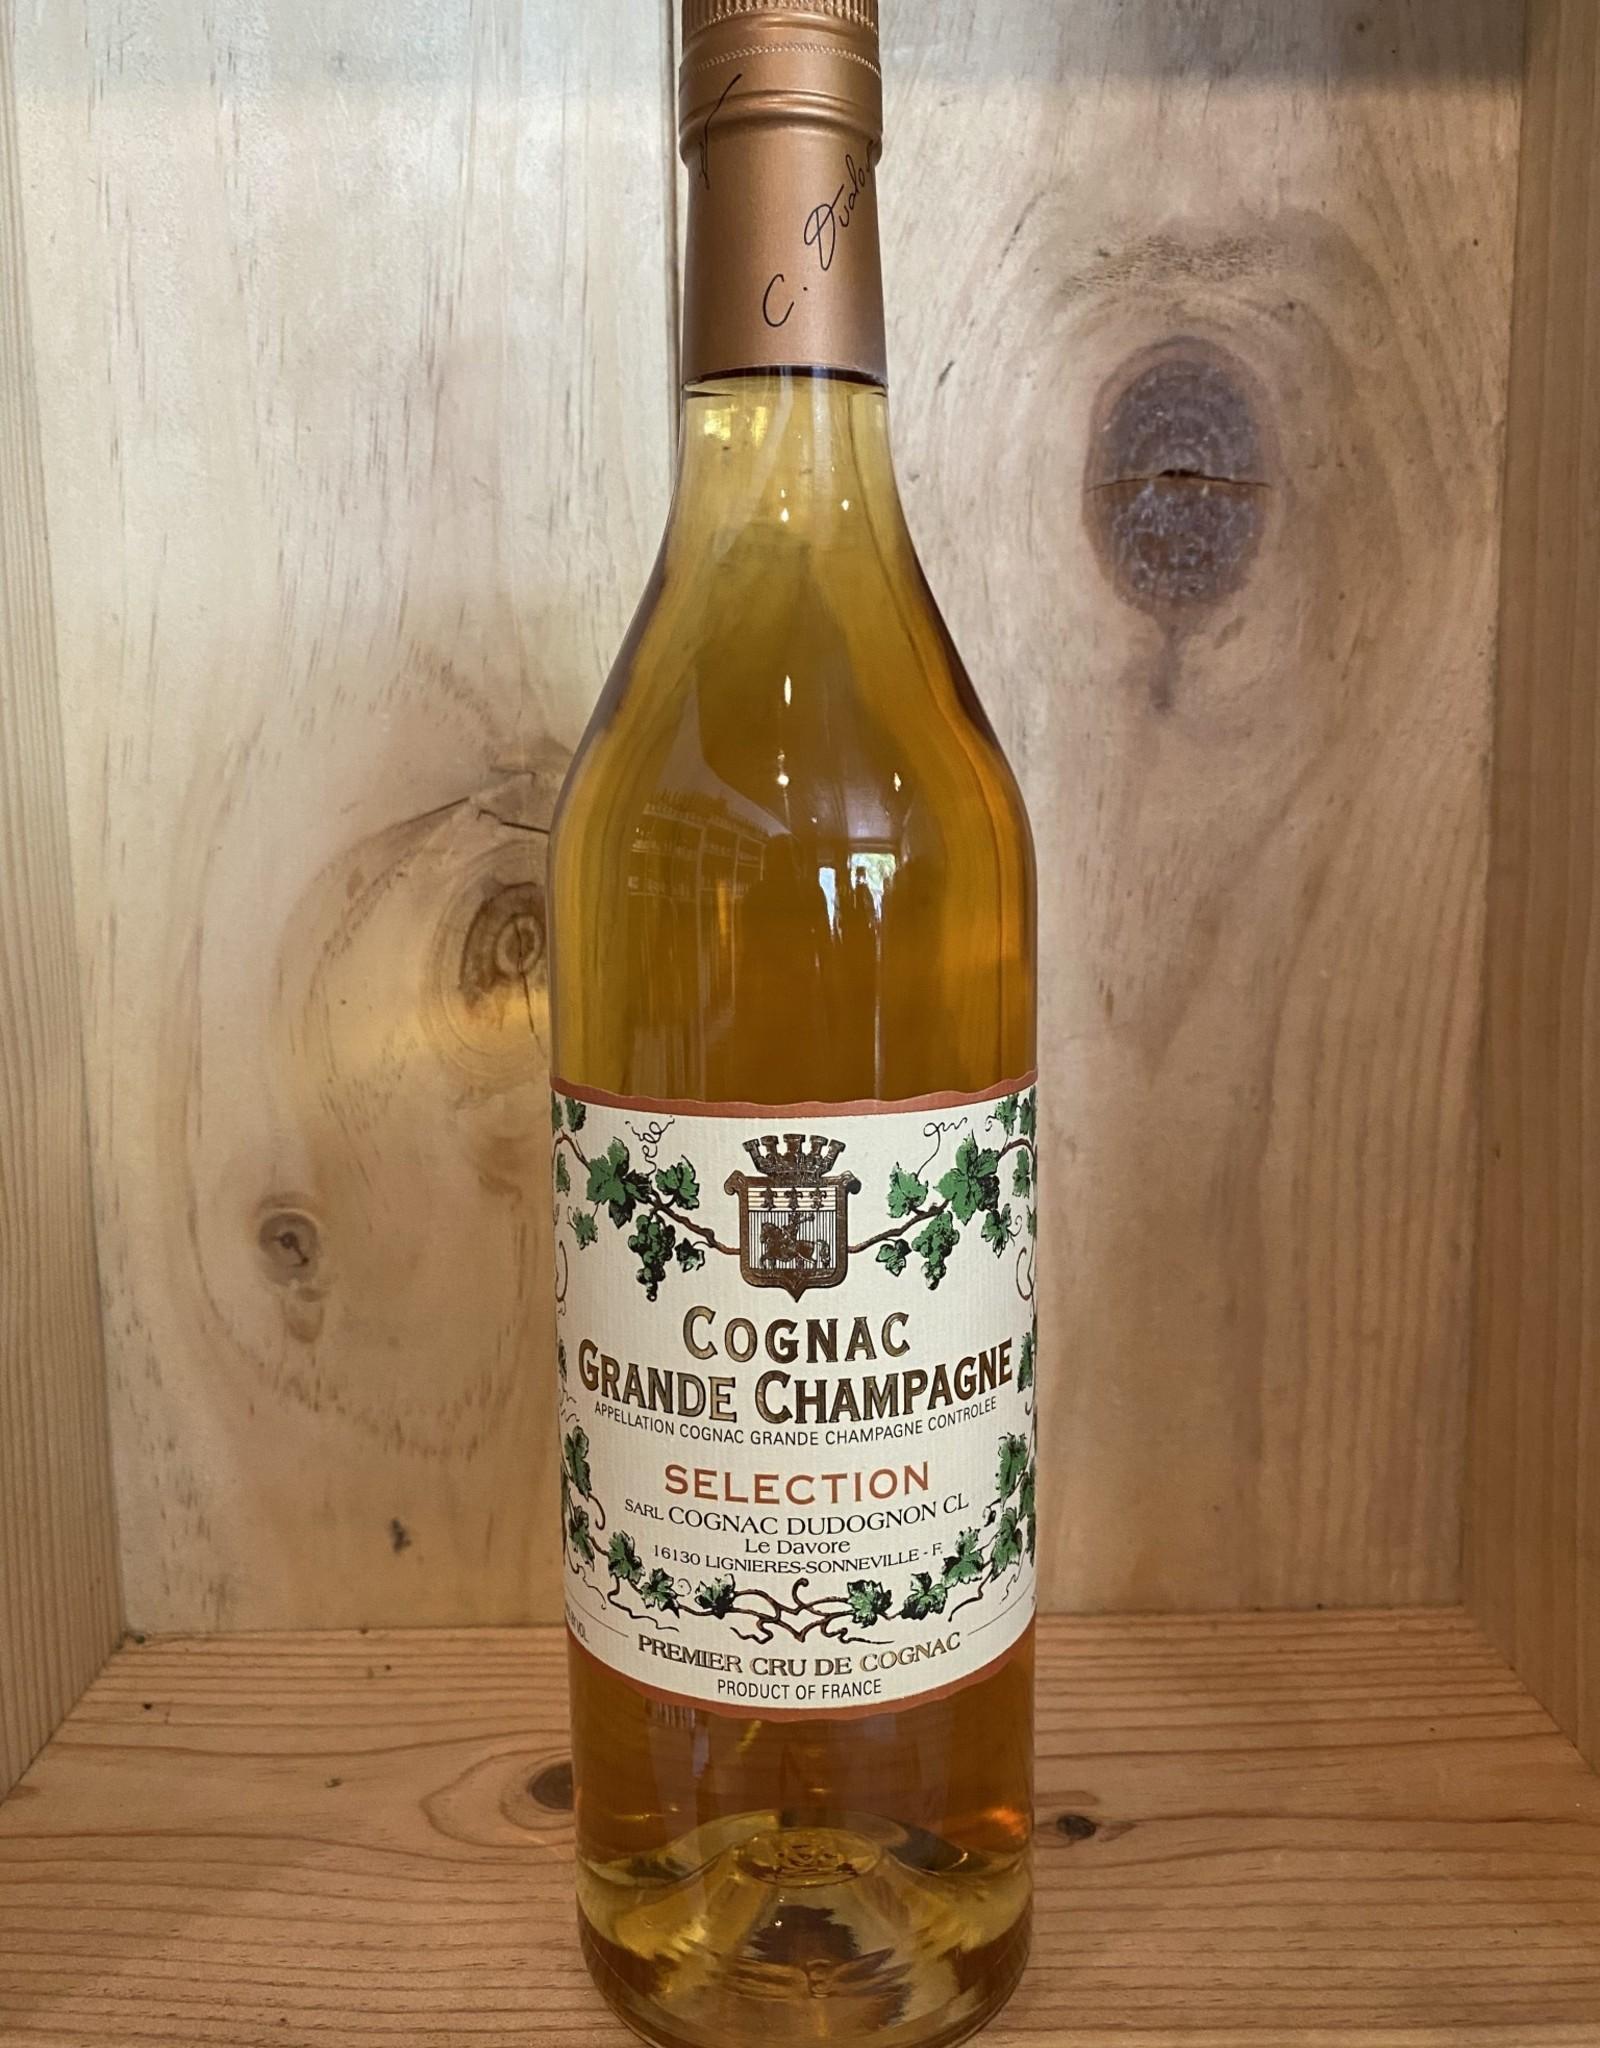 Spirits Cognac, Grande Champagne, 'Selection, '5 YR, Dudognon